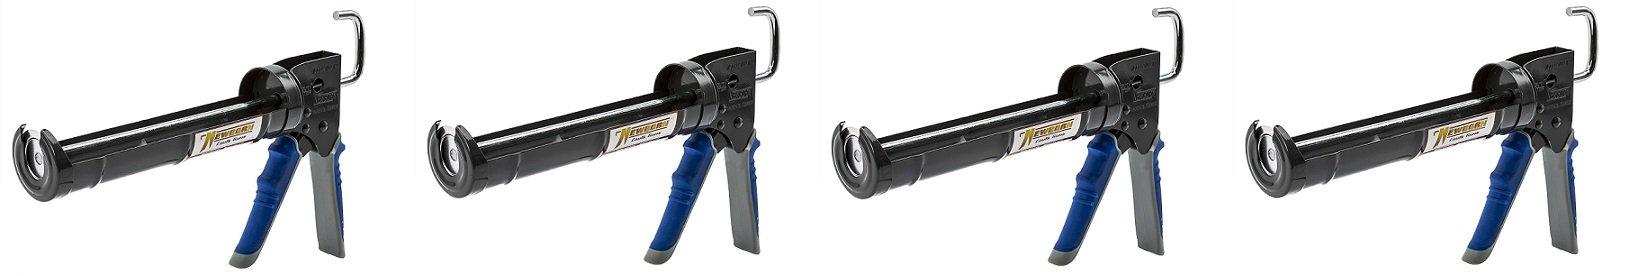 Newborn Pro Super Ratchet Rod Caulk Gun with Gator Trigger Comfort Grip, 1/10 Gallon Cartridge, 6:1 Thrust Ratio (4)